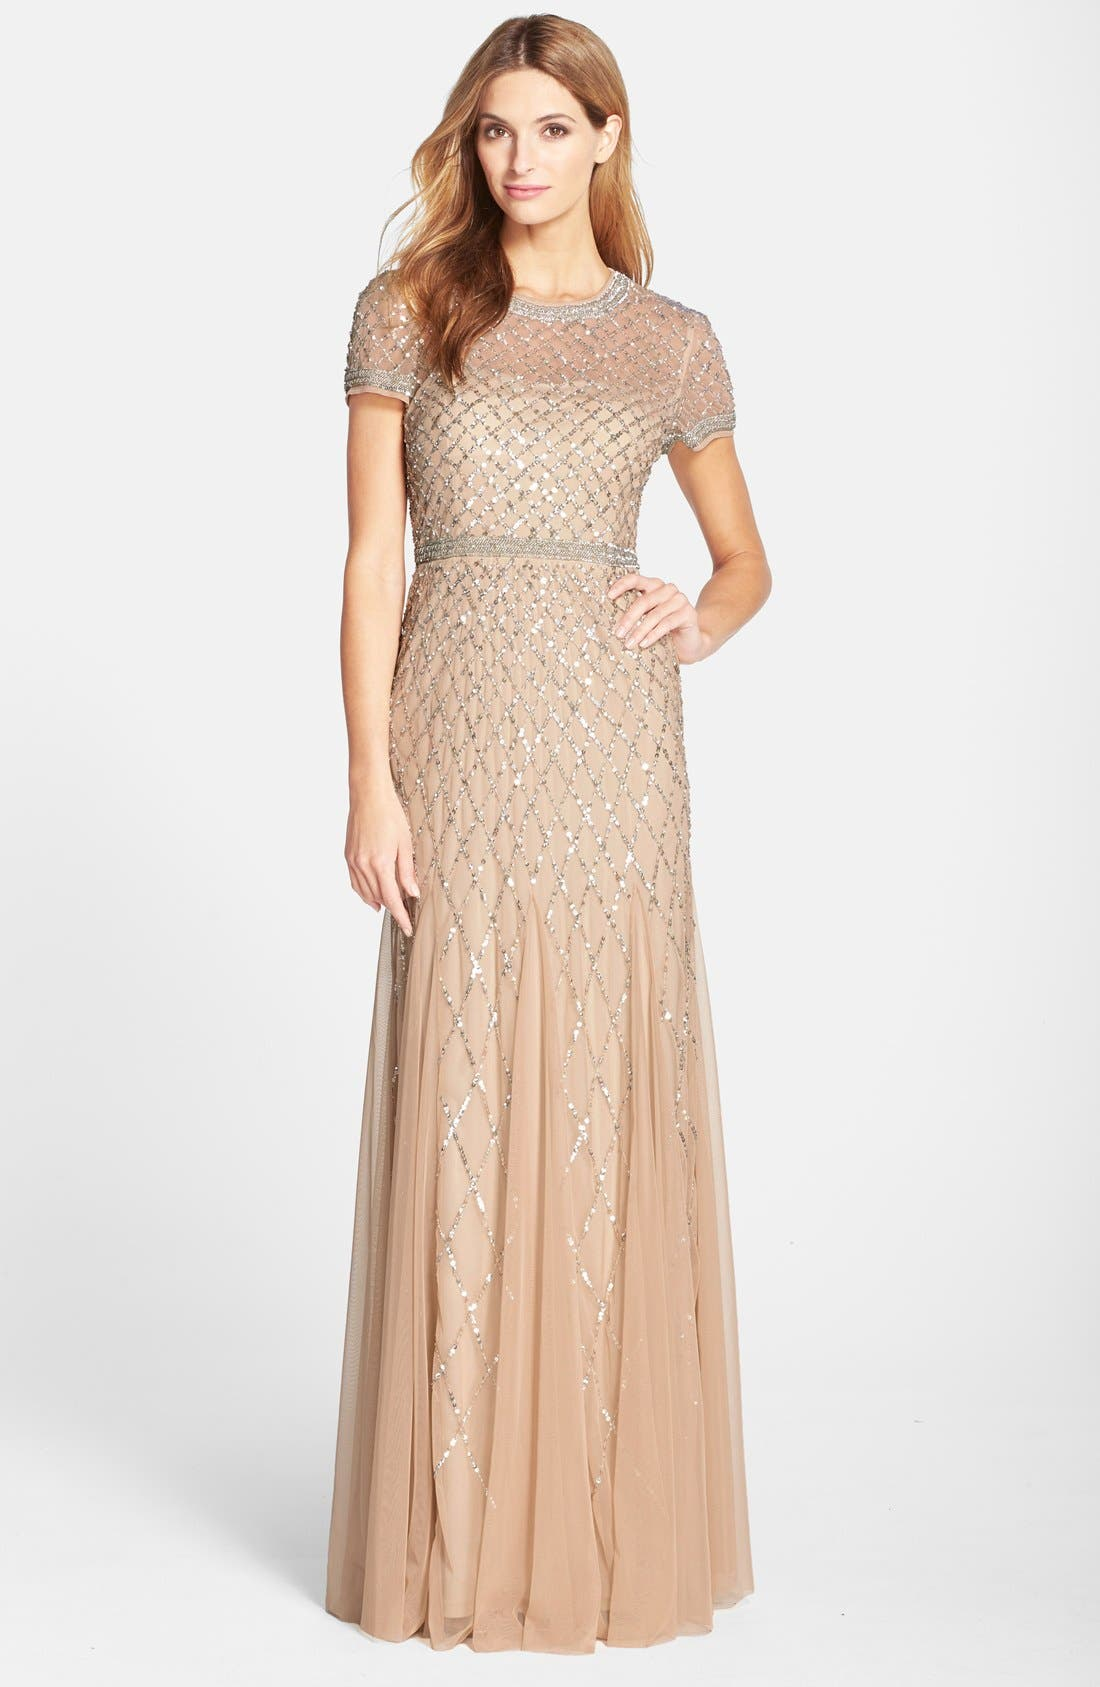 Sand colored dress on tan skin